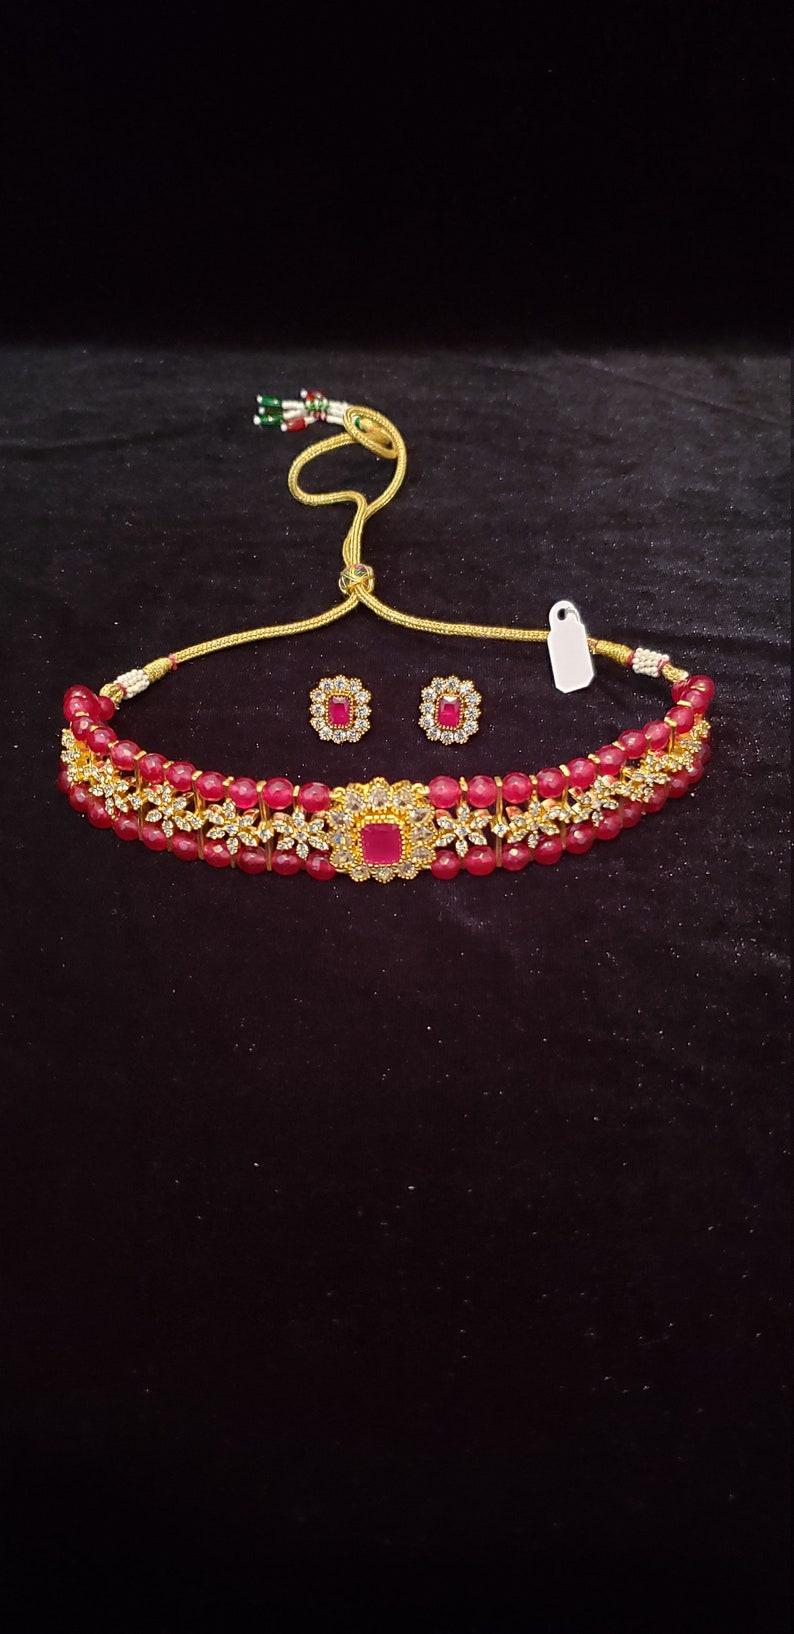 Cubic zirconia beautiful jewelry for adults and kids  too Ruby beads semiprecious Choker set Wedding jewelry